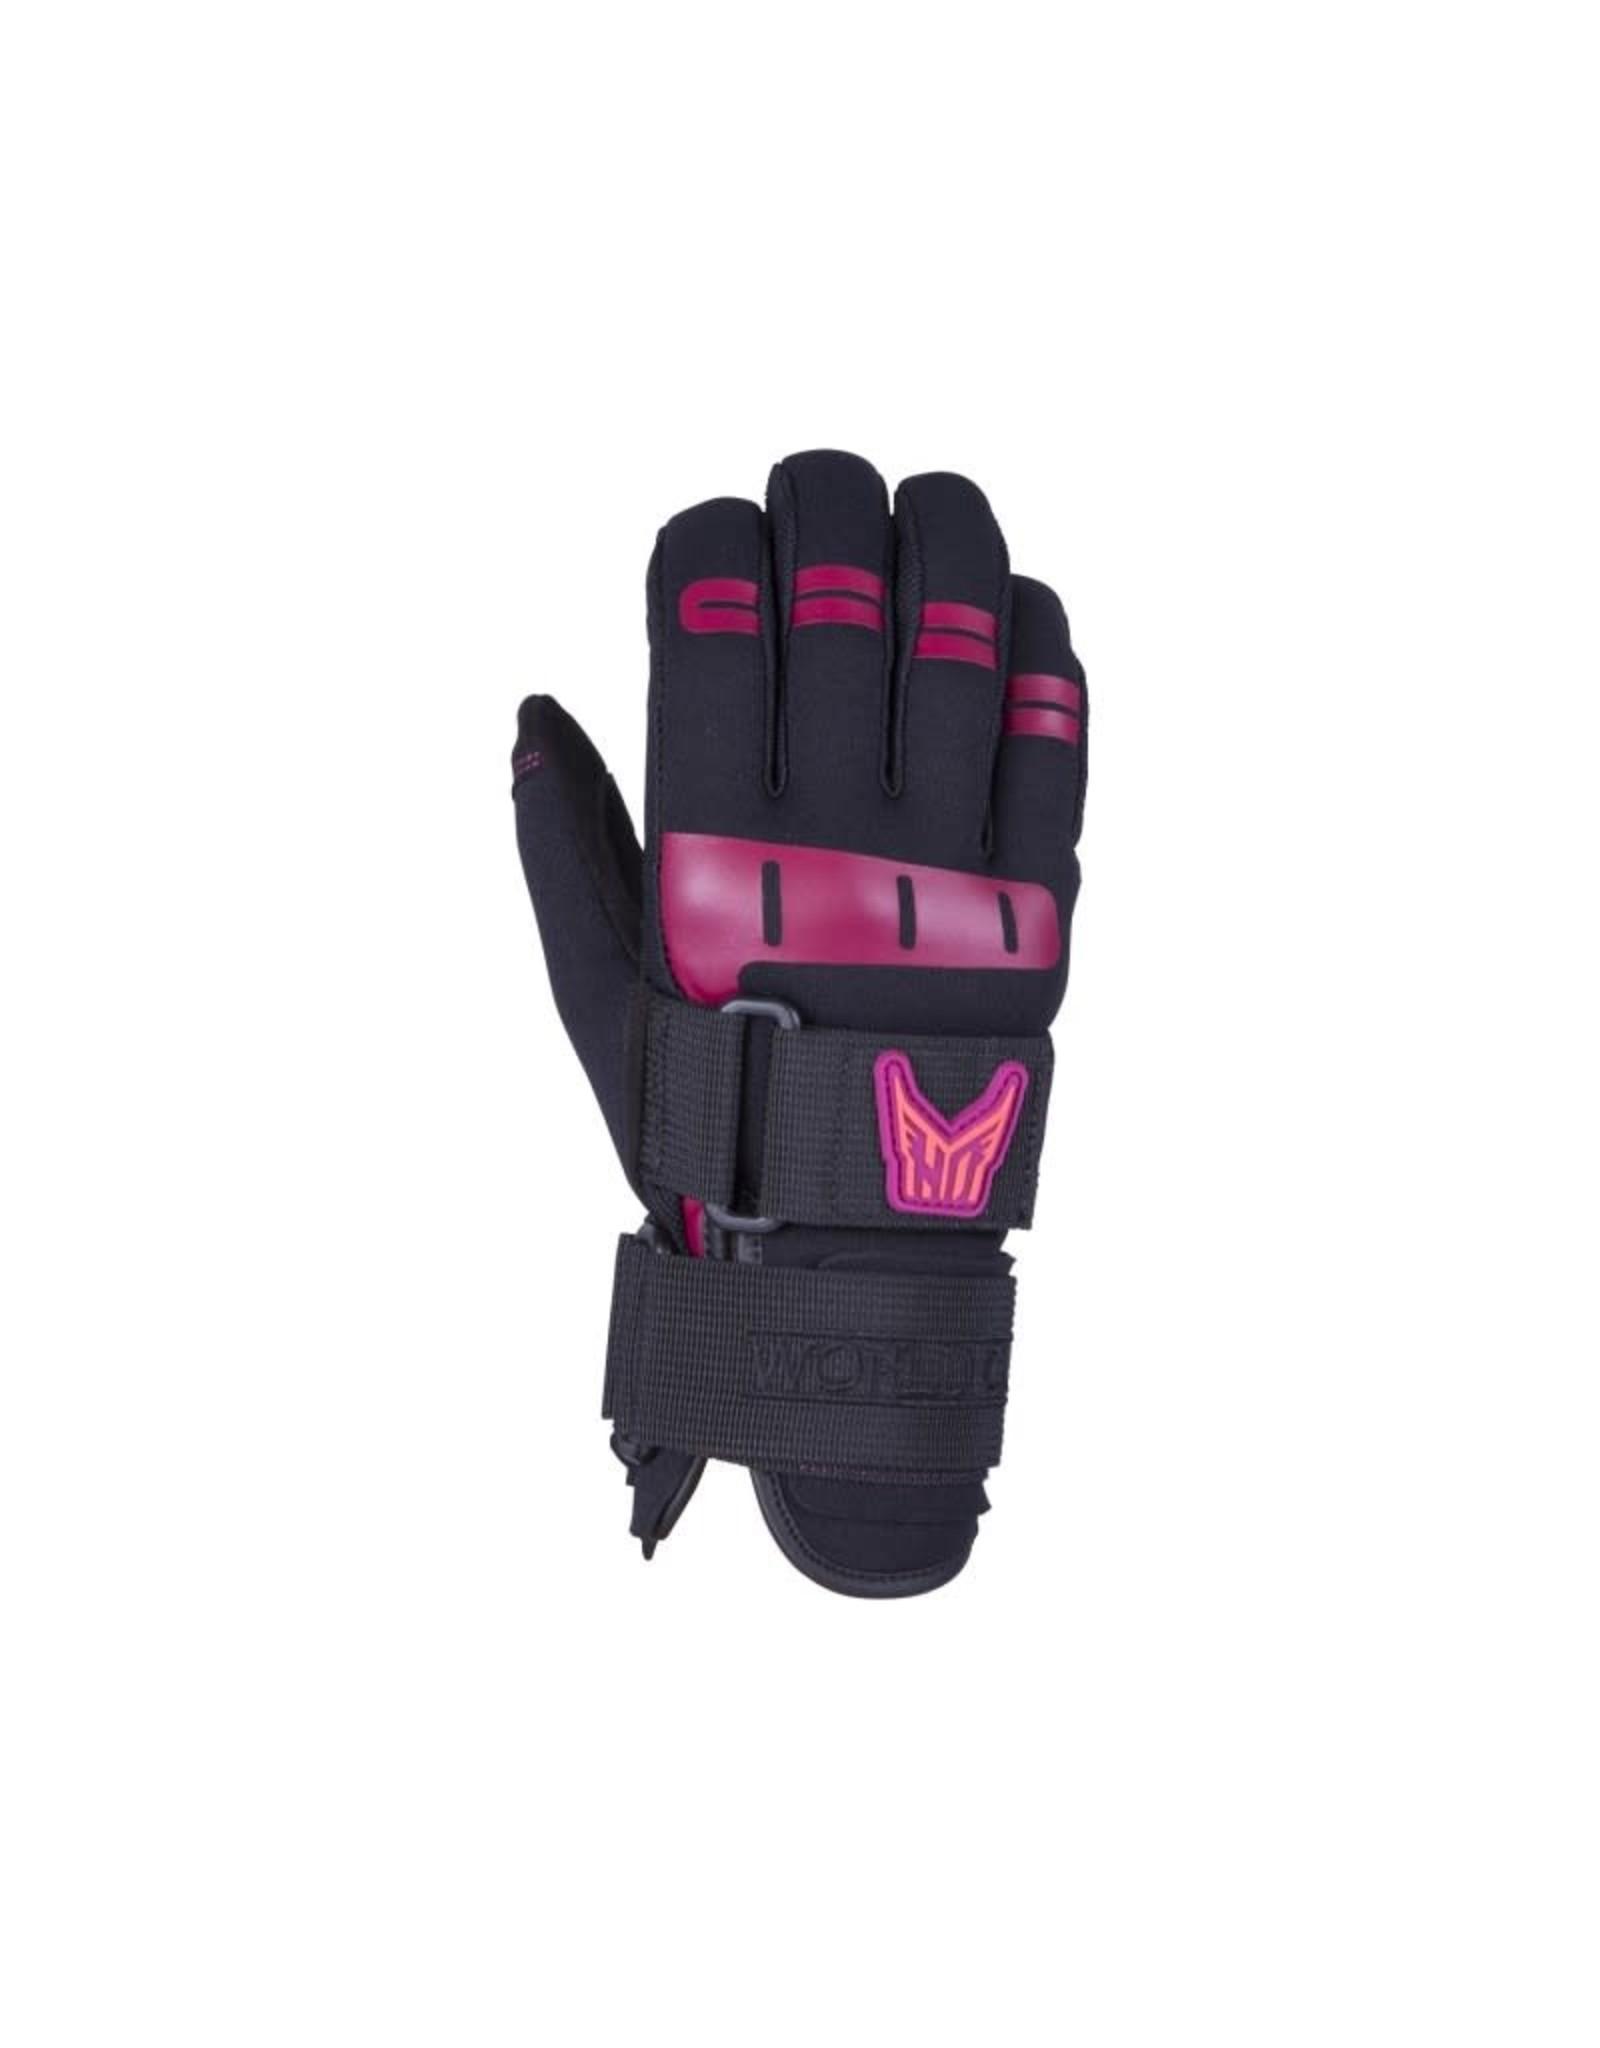 HO Womens World Cup Glove